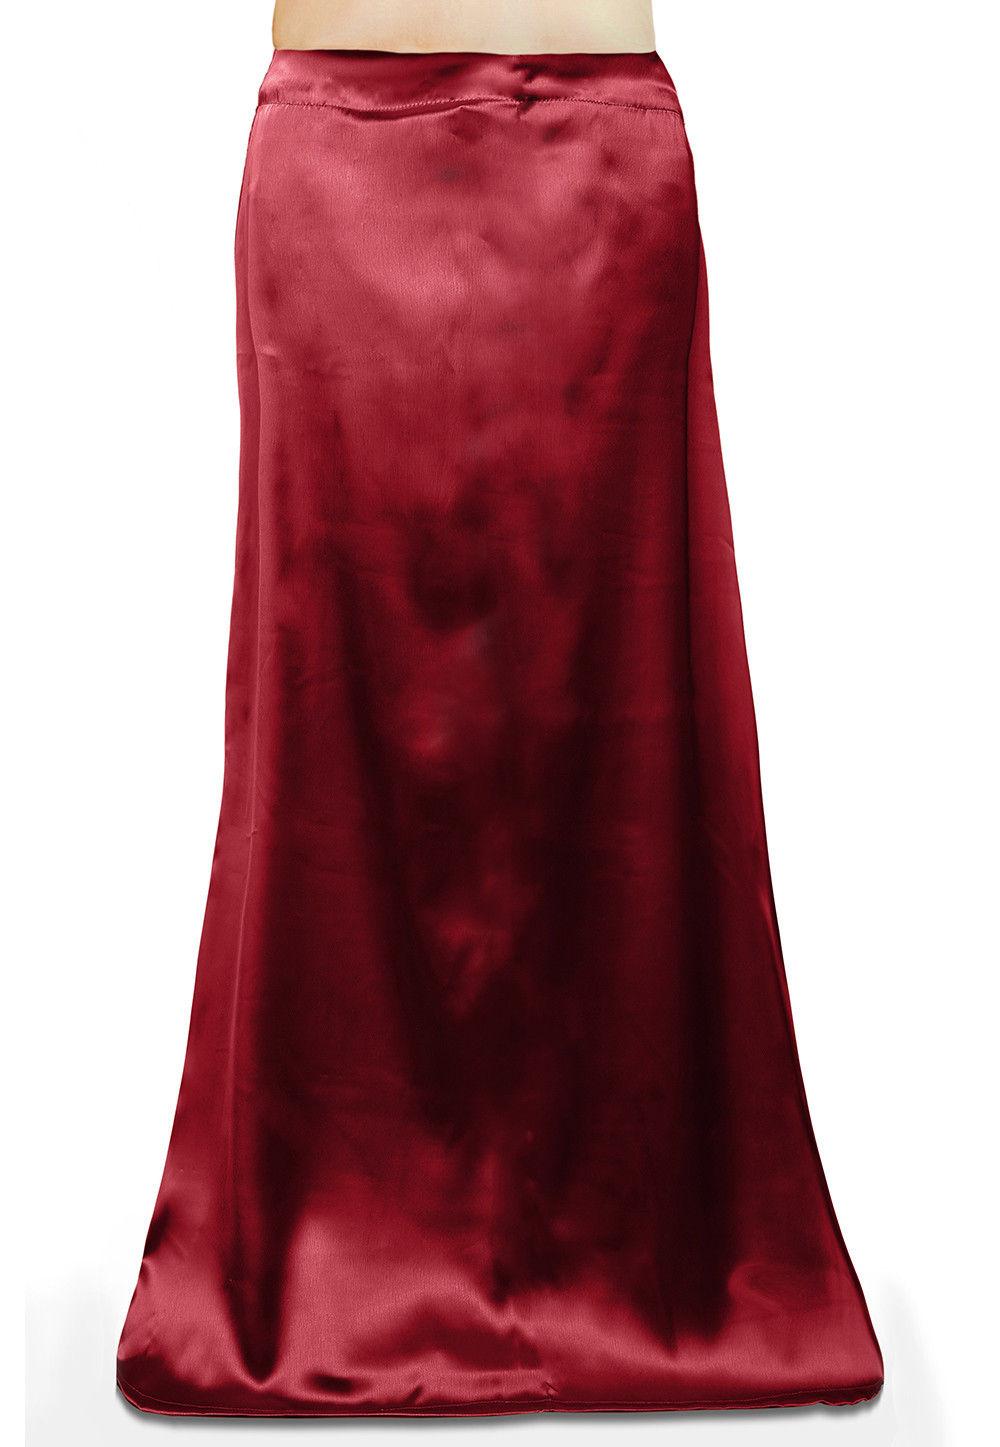 Plain Satin Readymade Petticoat in Maroon